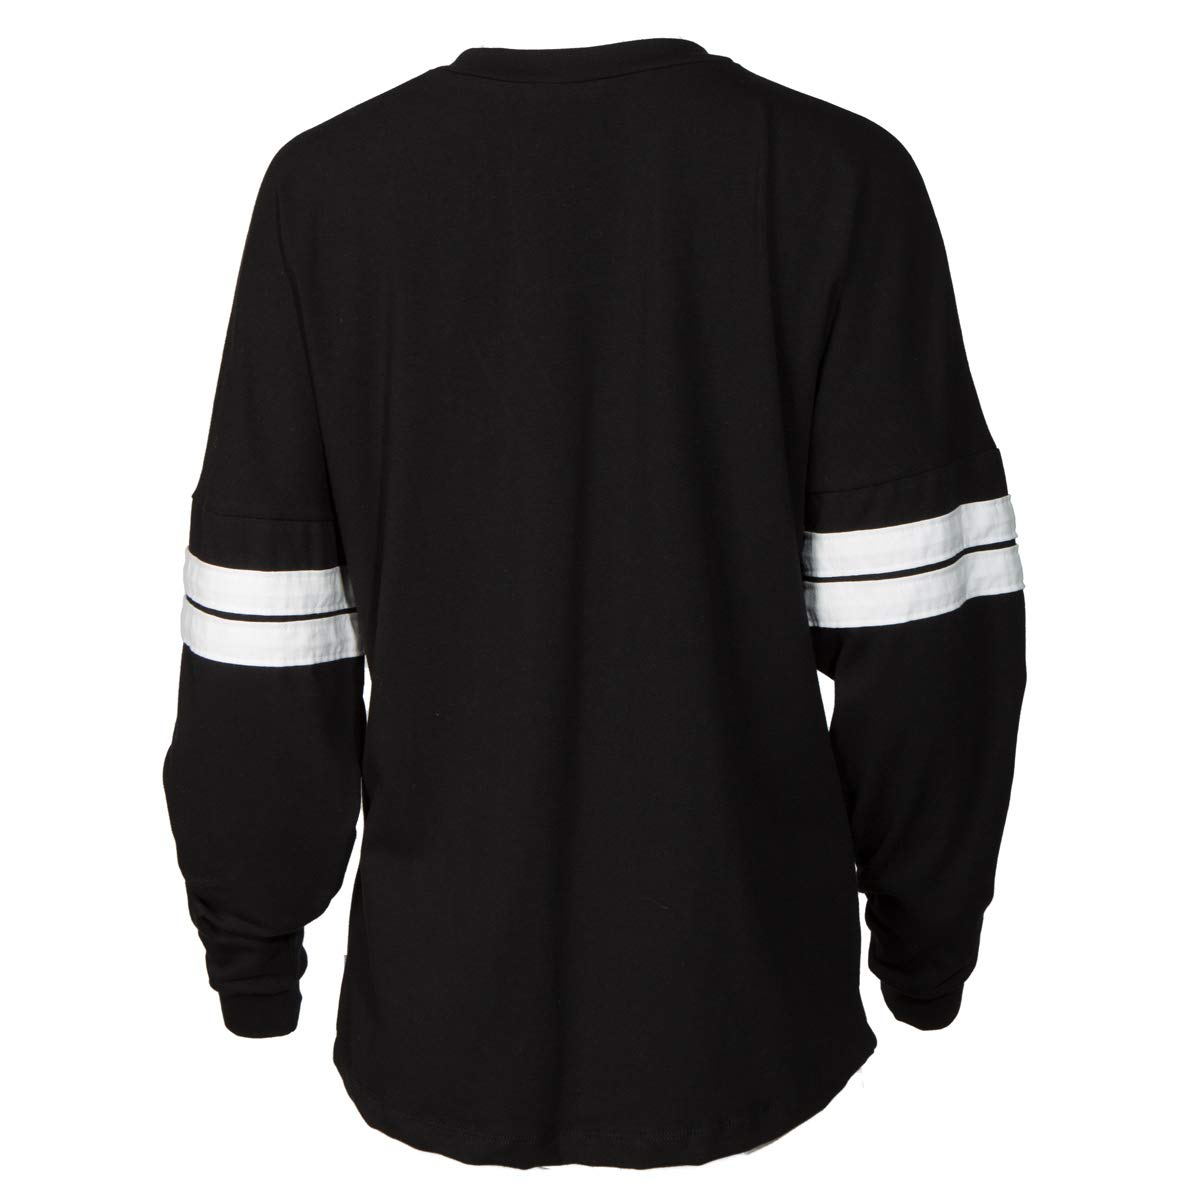 afadeb28fecf07 Amazon.com: Official NCAA UCF Knights Women's Striped Oversized Football  Tee: Clothing